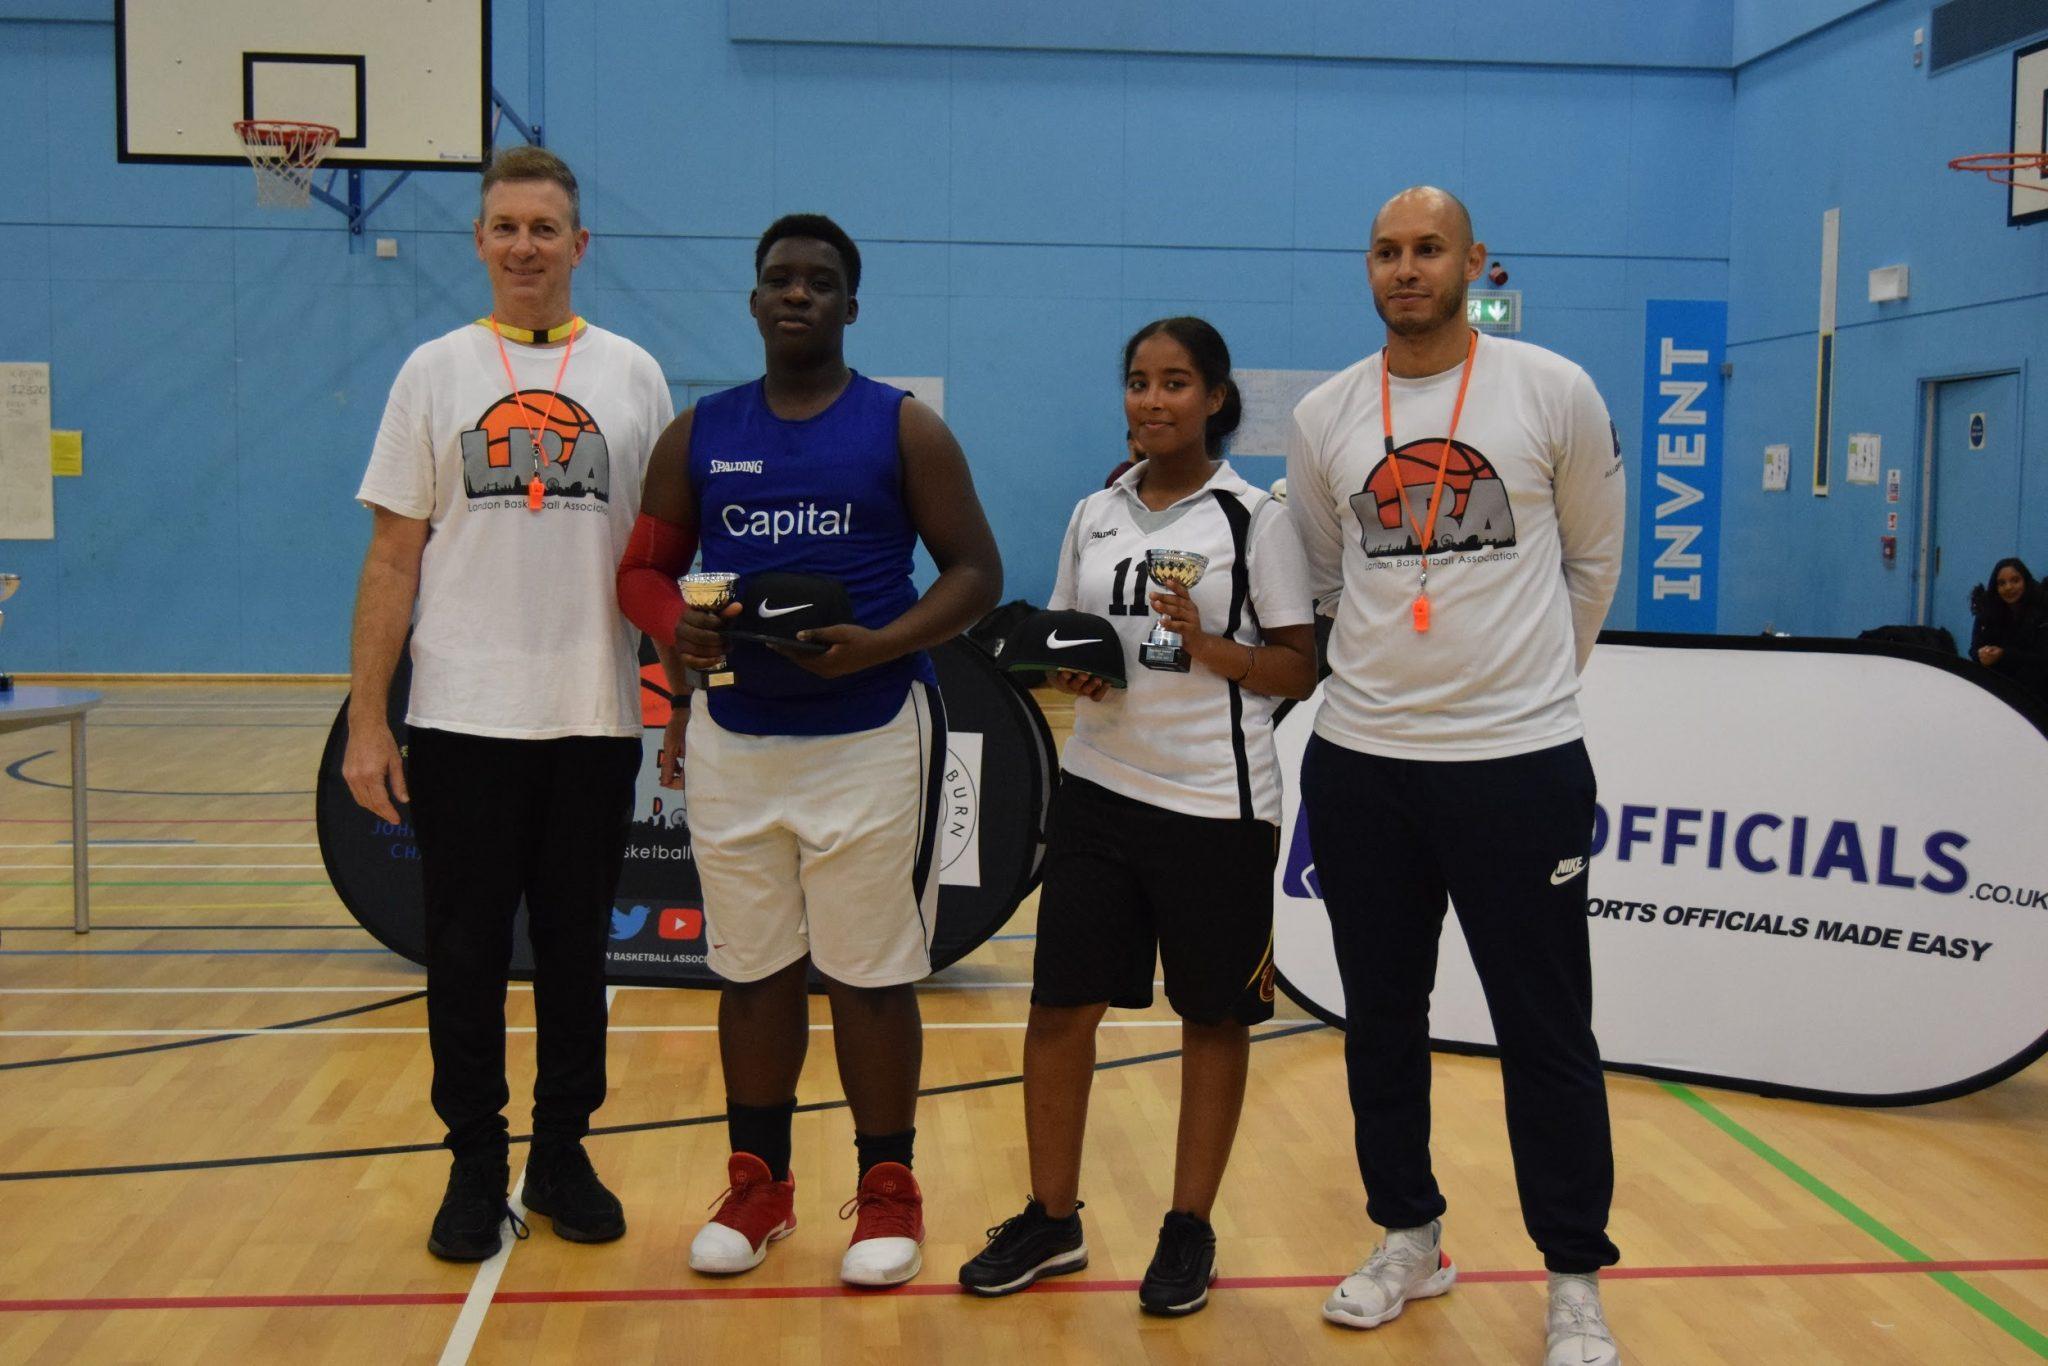 Brent U16 Girls MVP: Ark Academy; Brent U16 Boys MVP: Jake Akkinuiye from Capital City Academy